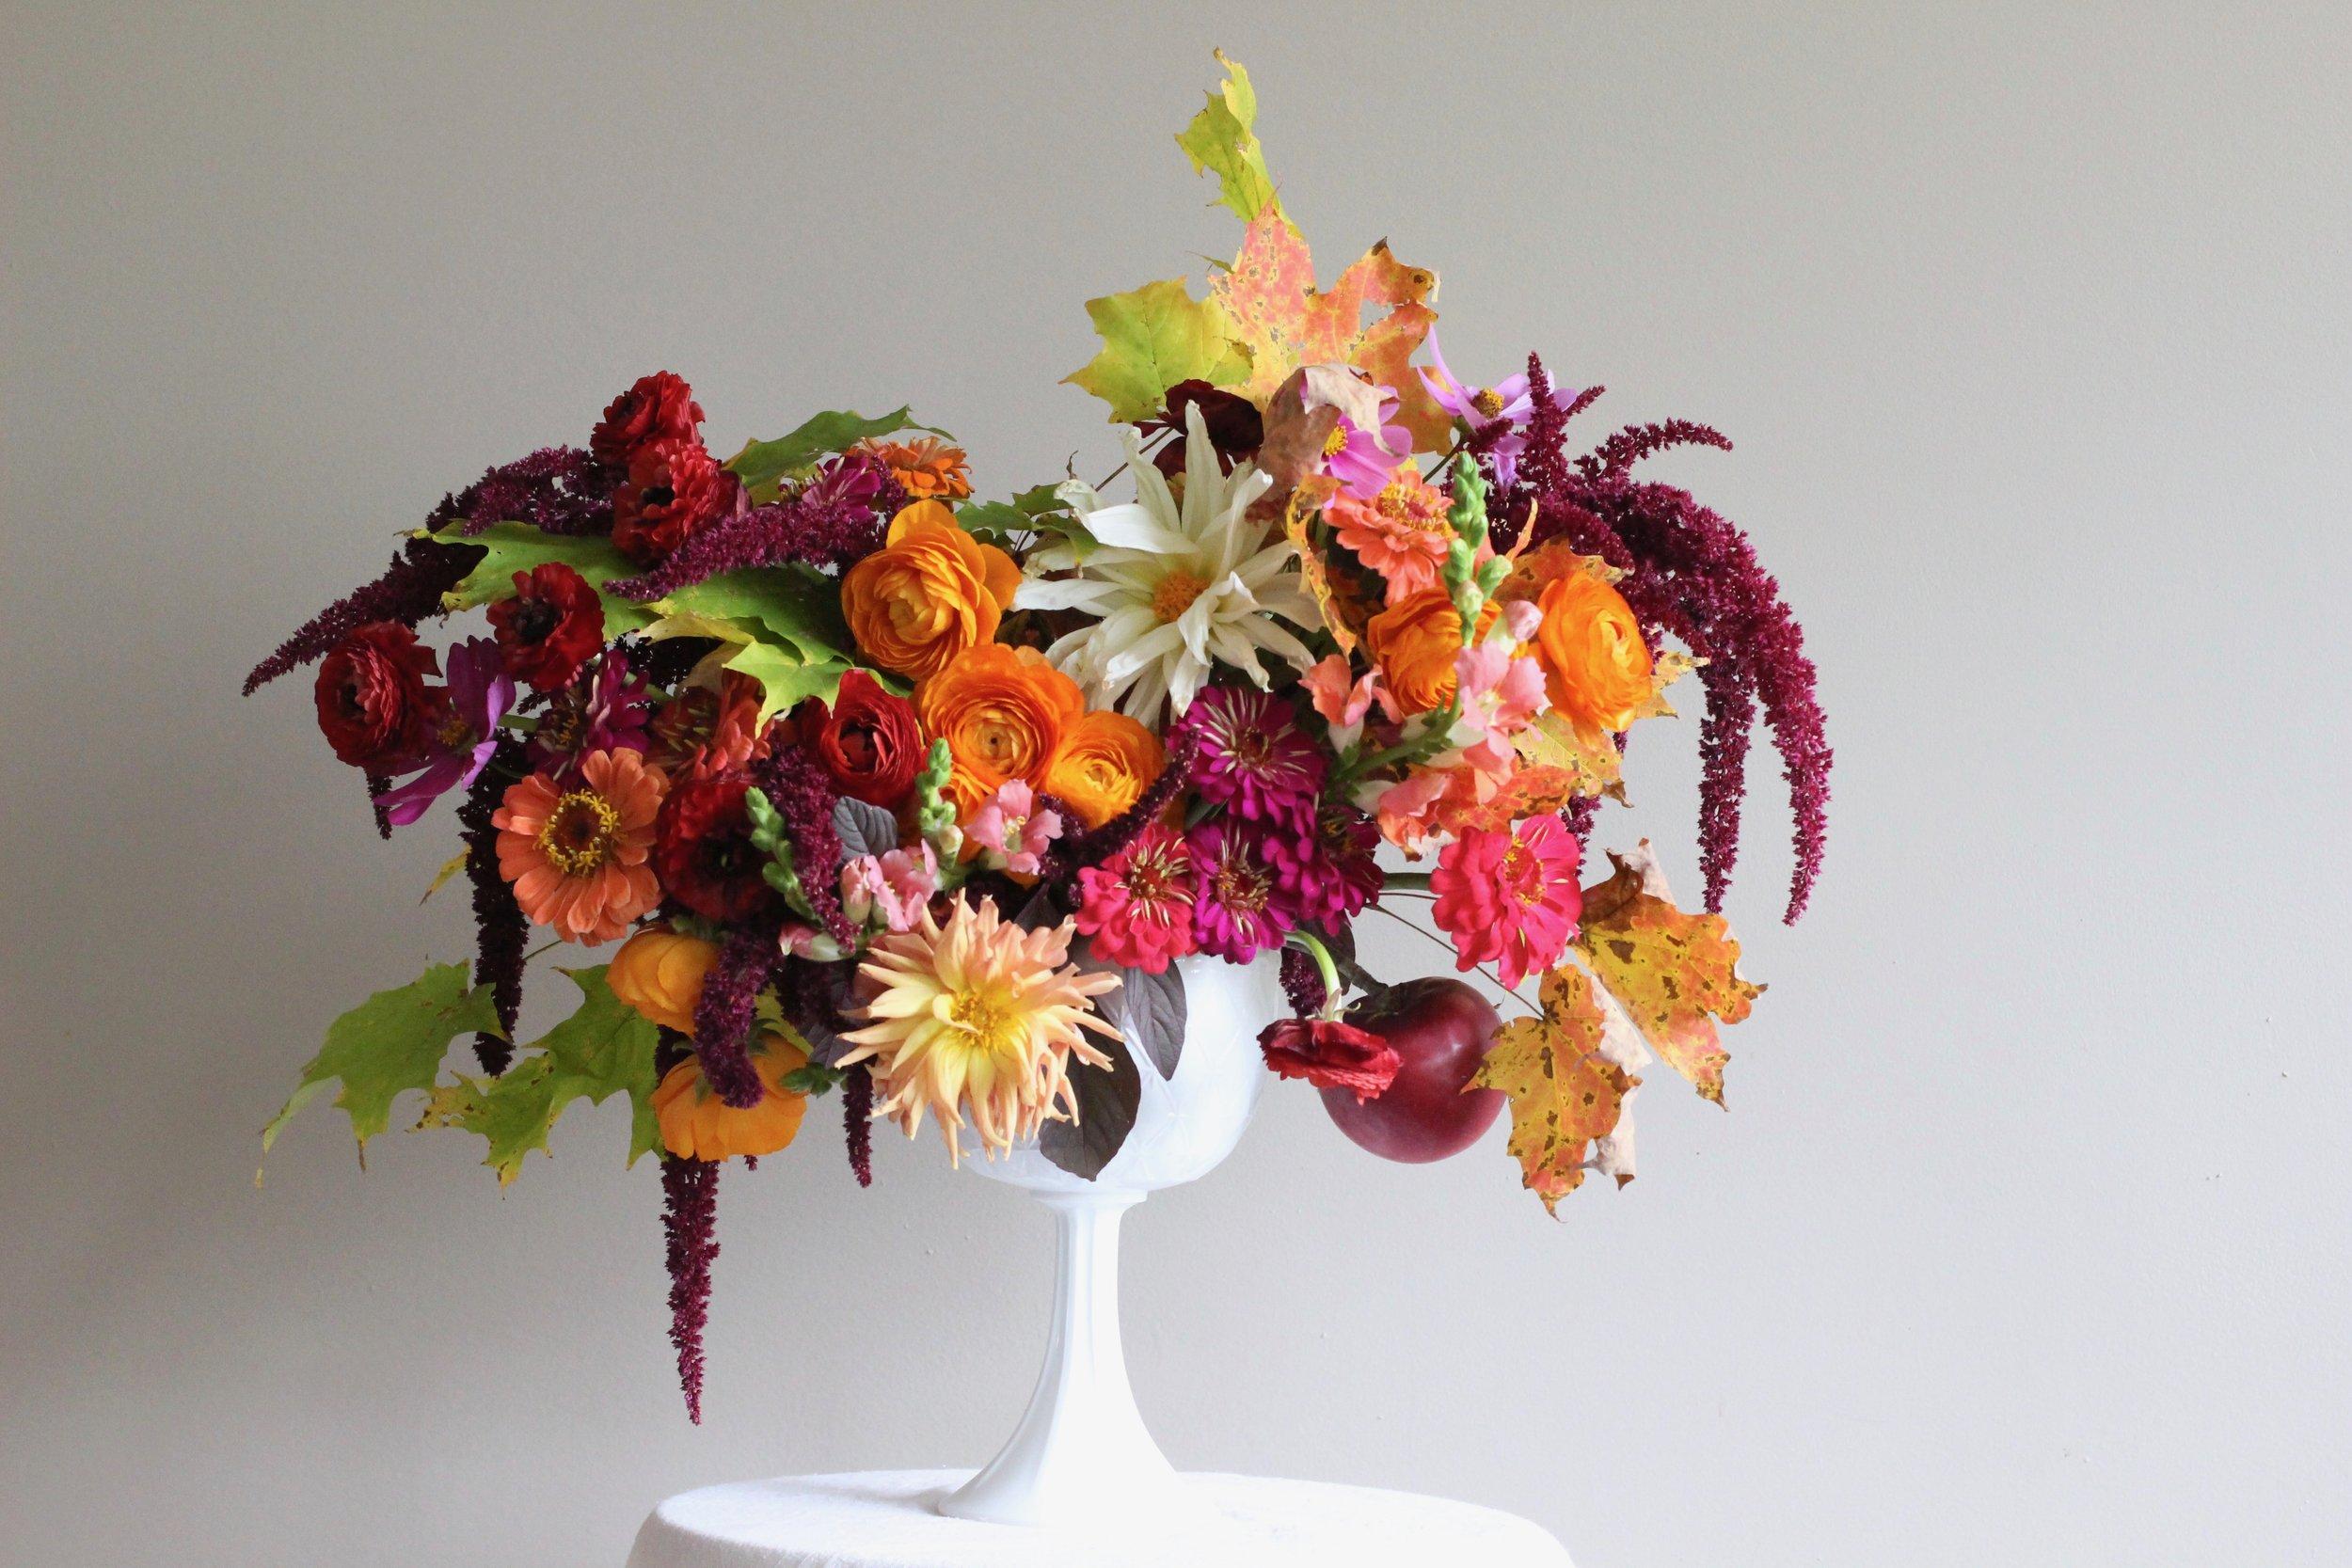 Bowl Full of Fruit Harvest Bouquet | Florist | Loveshyla.com